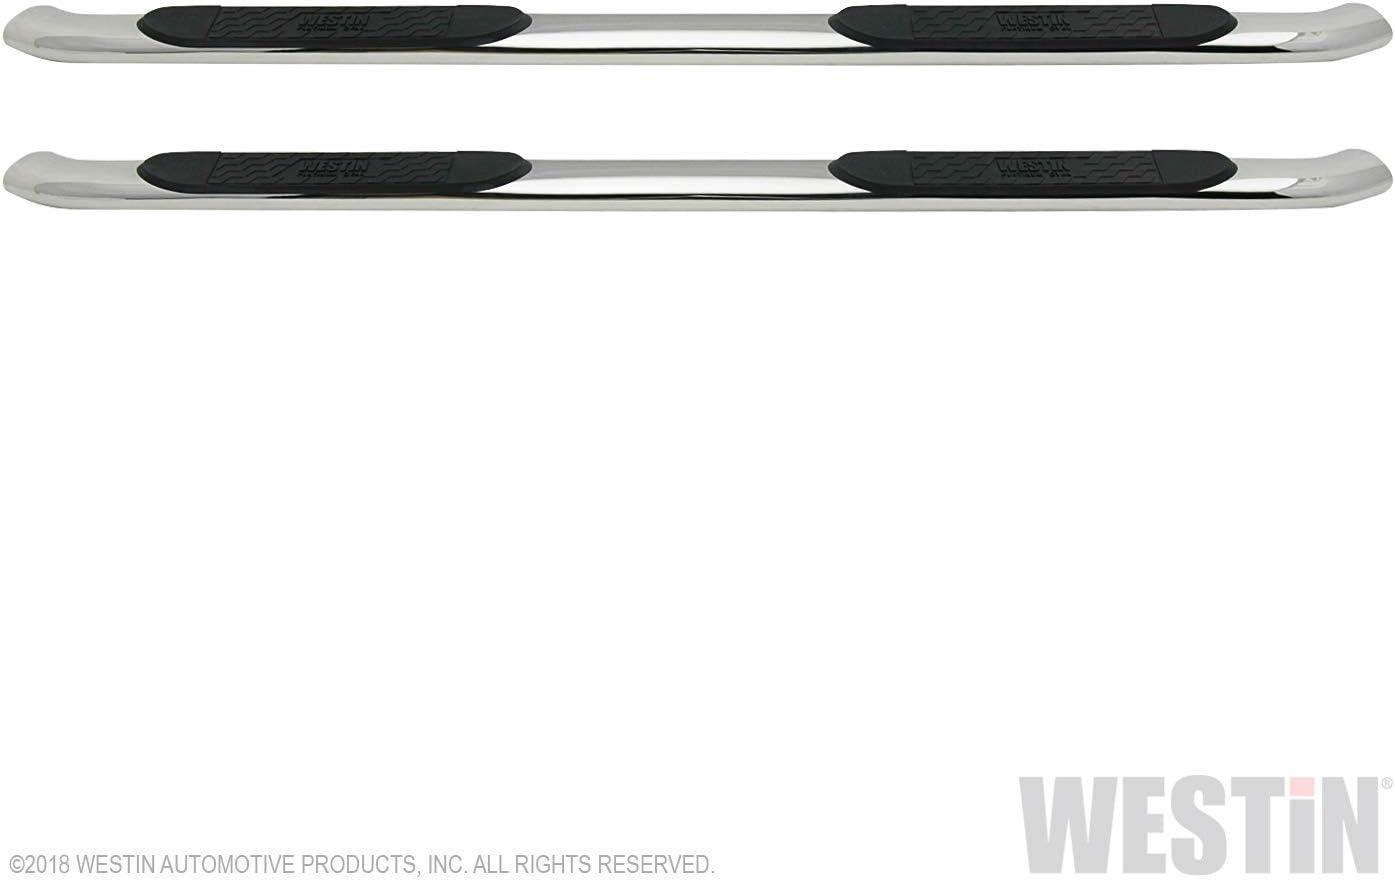 Westin 21-3580 Platinum Polished Oval Step Bar